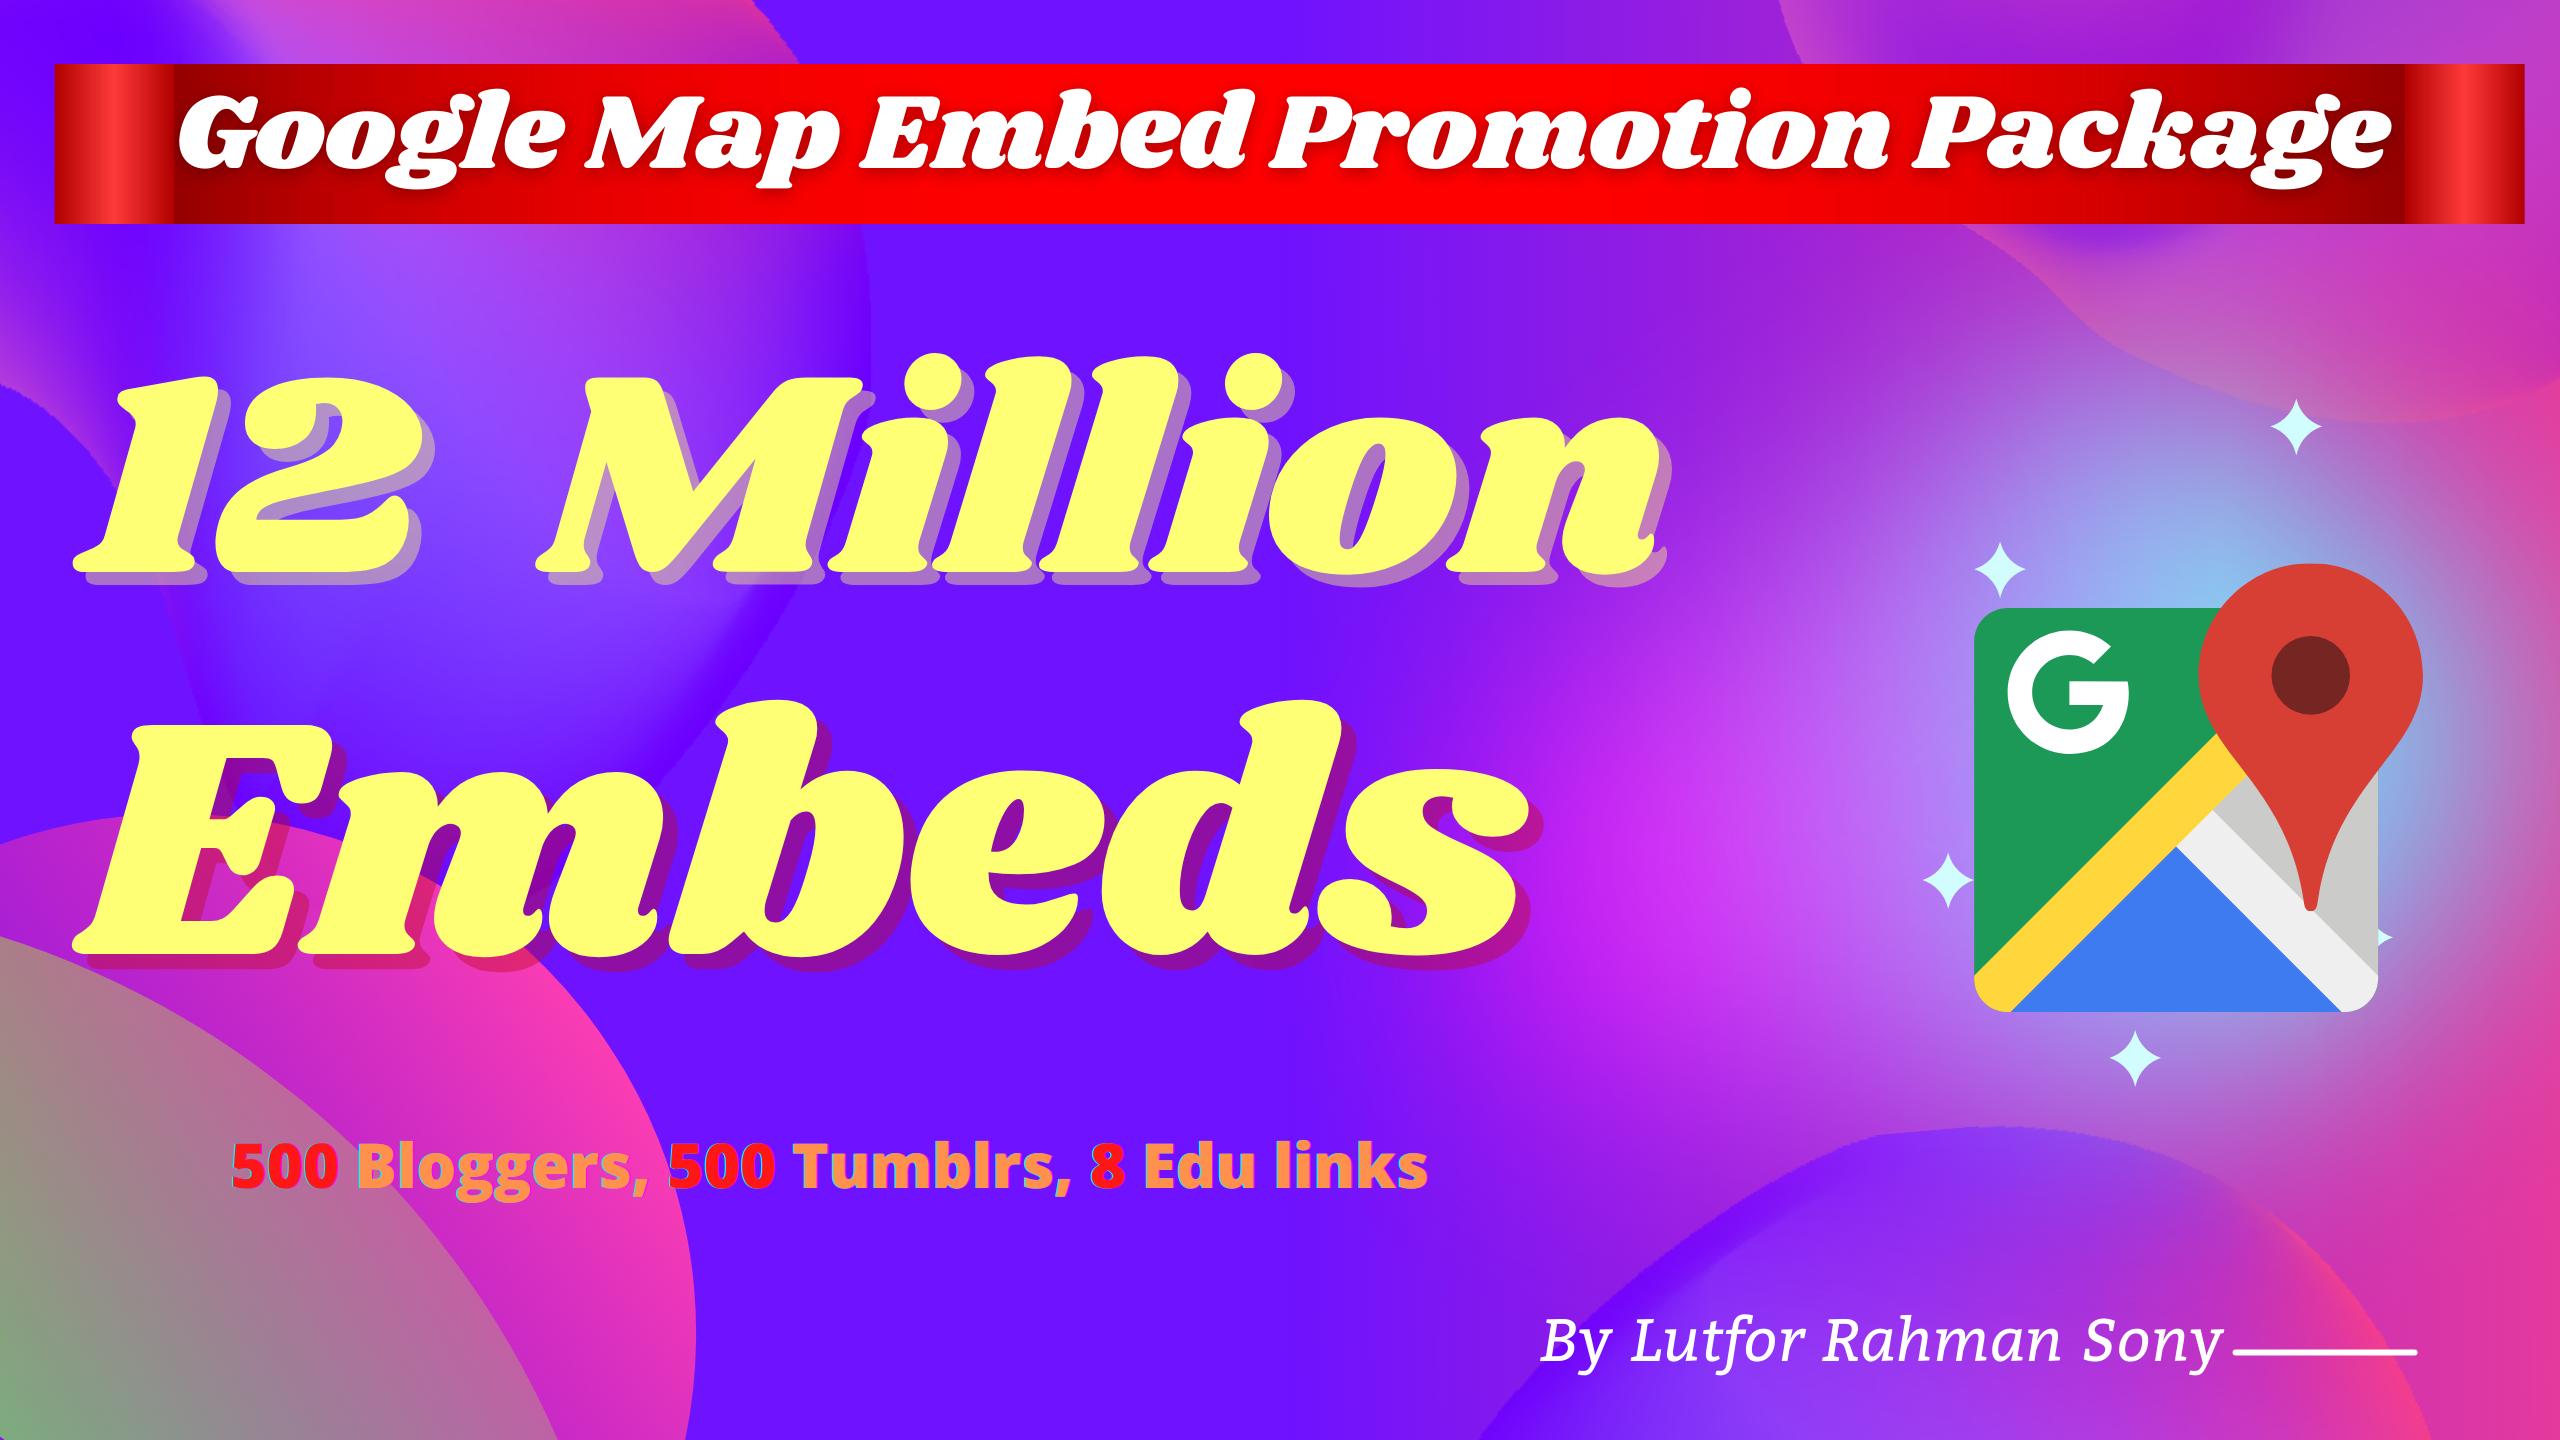 Google Marketing Google Embed on 500 Blogger,  500 Tumblr,  12 Million Post Embeds Backlink